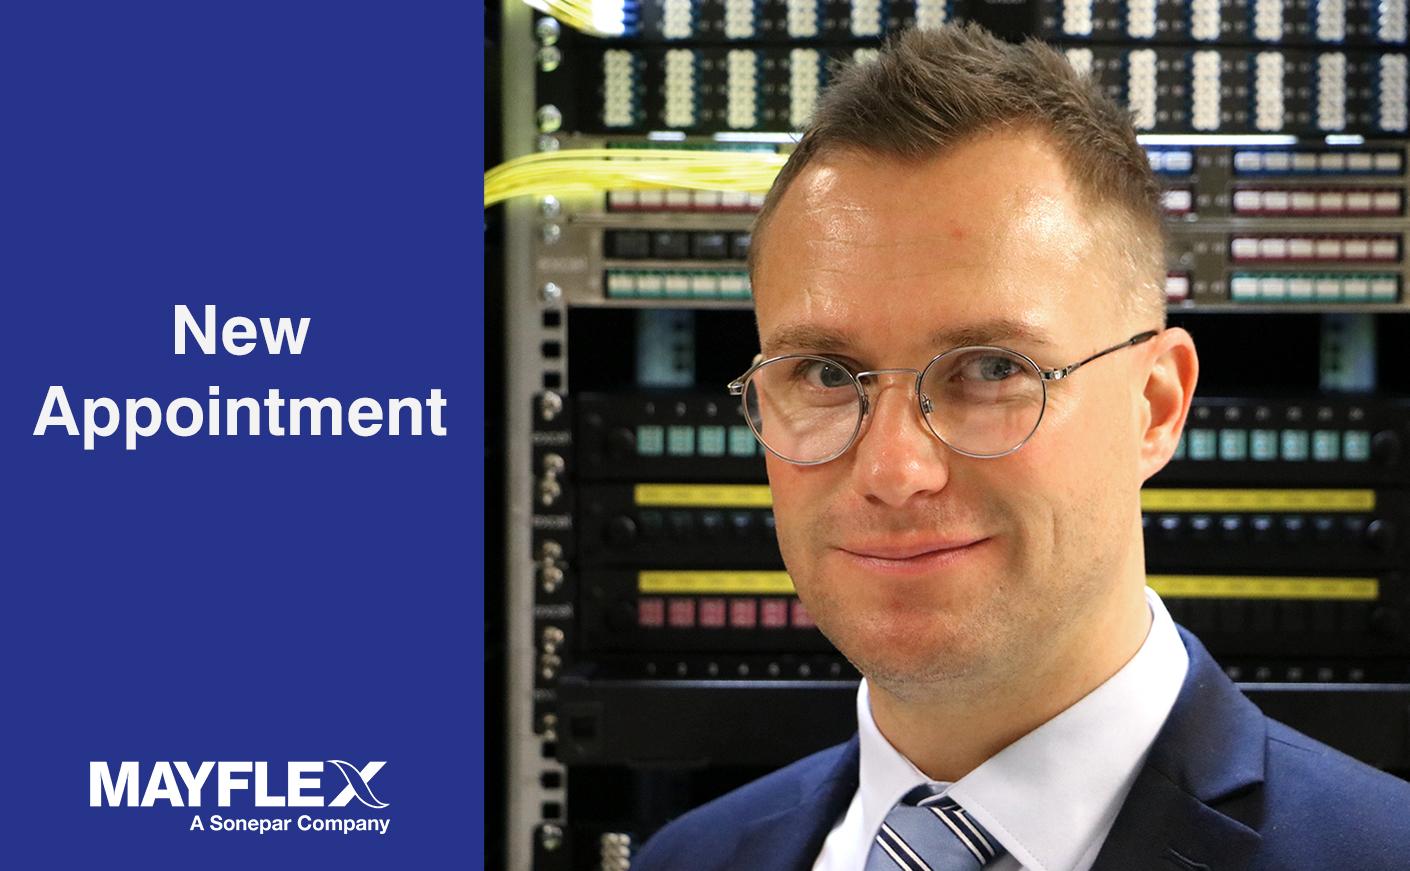 Mayflex-security-news